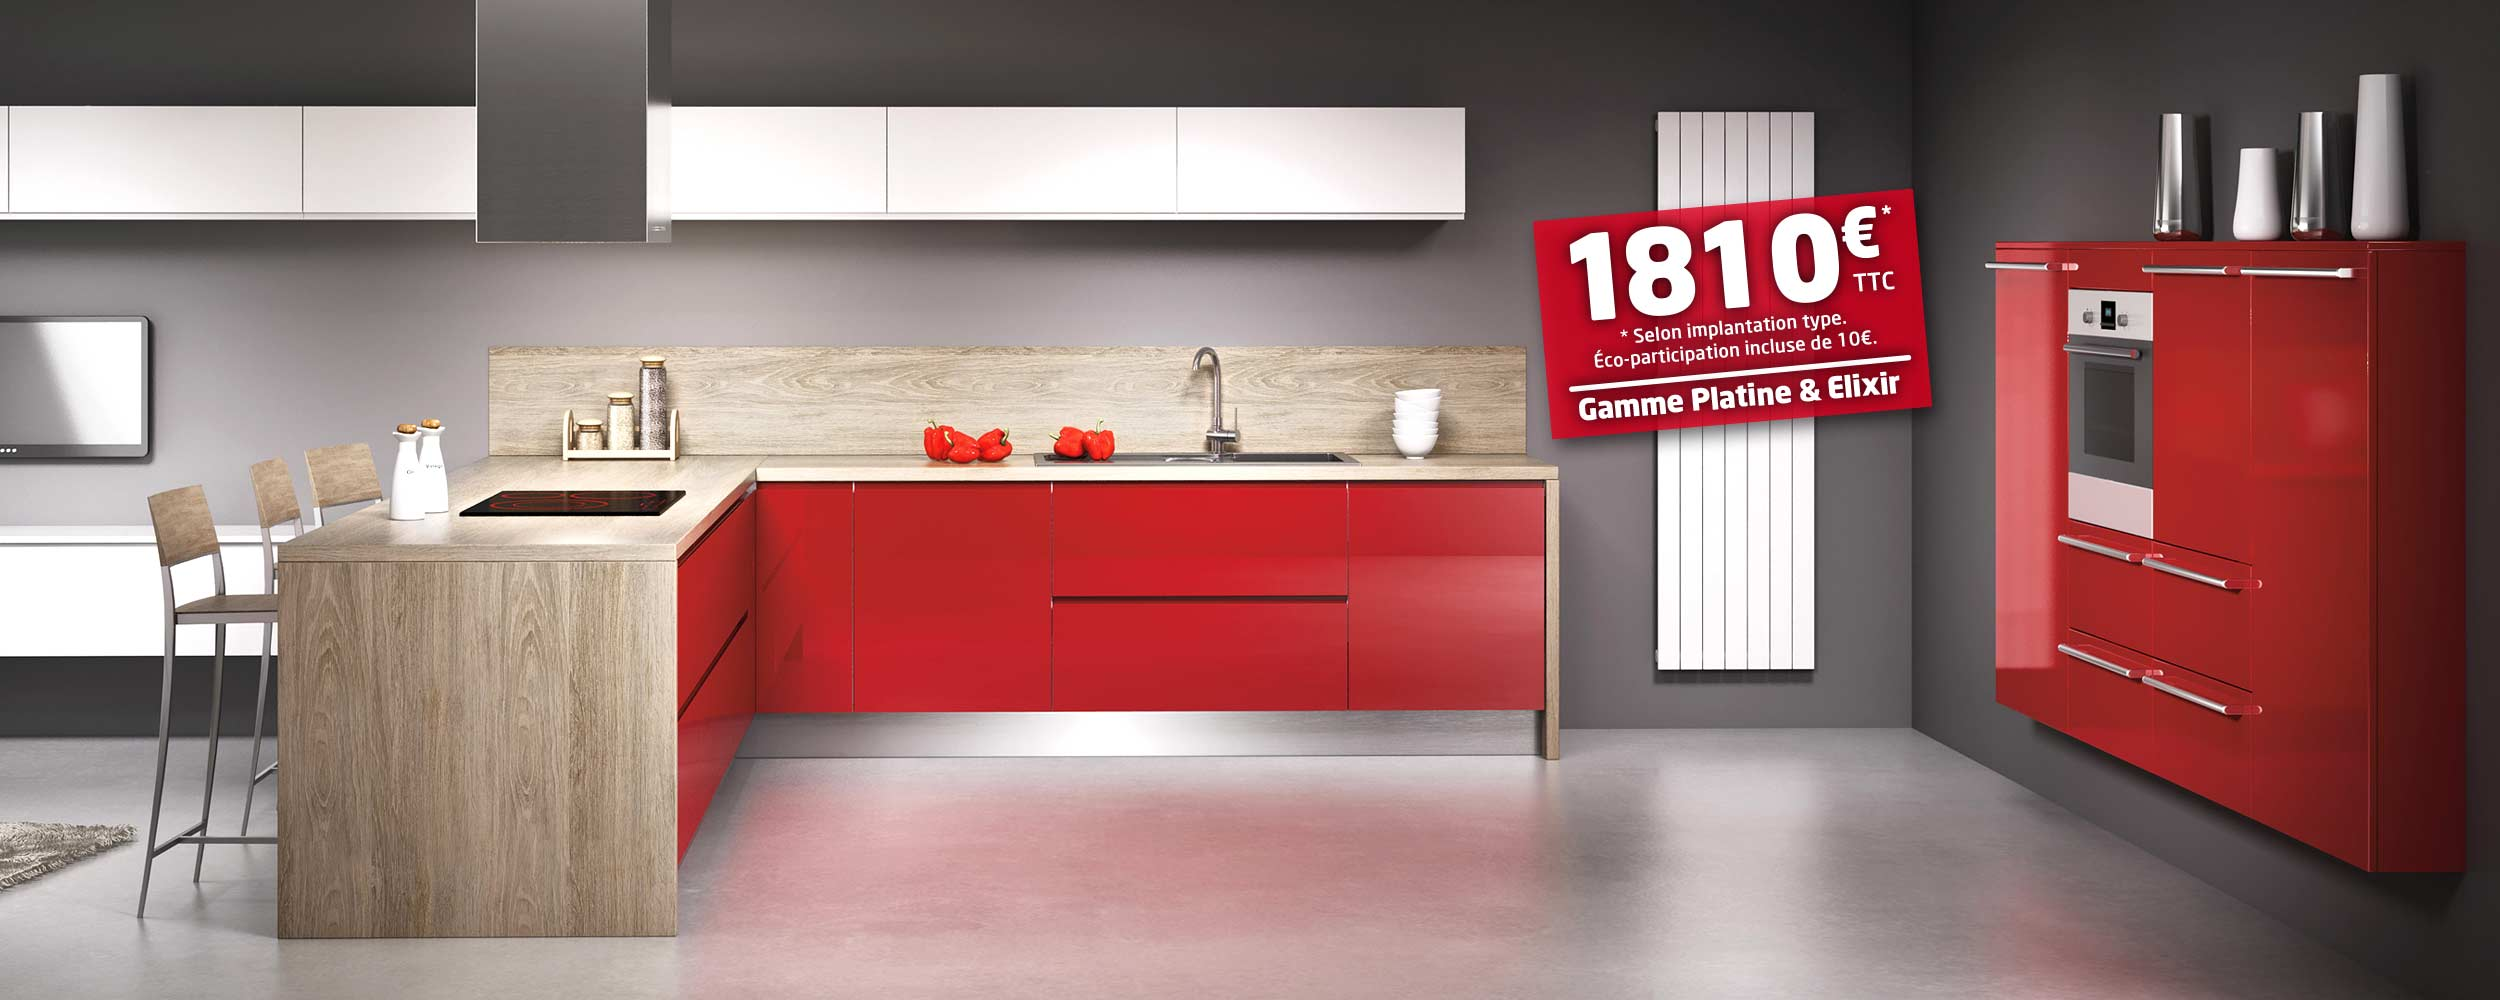 idea-cuisines-63-platine-cerise-brillant-et-Elixir-2500x800